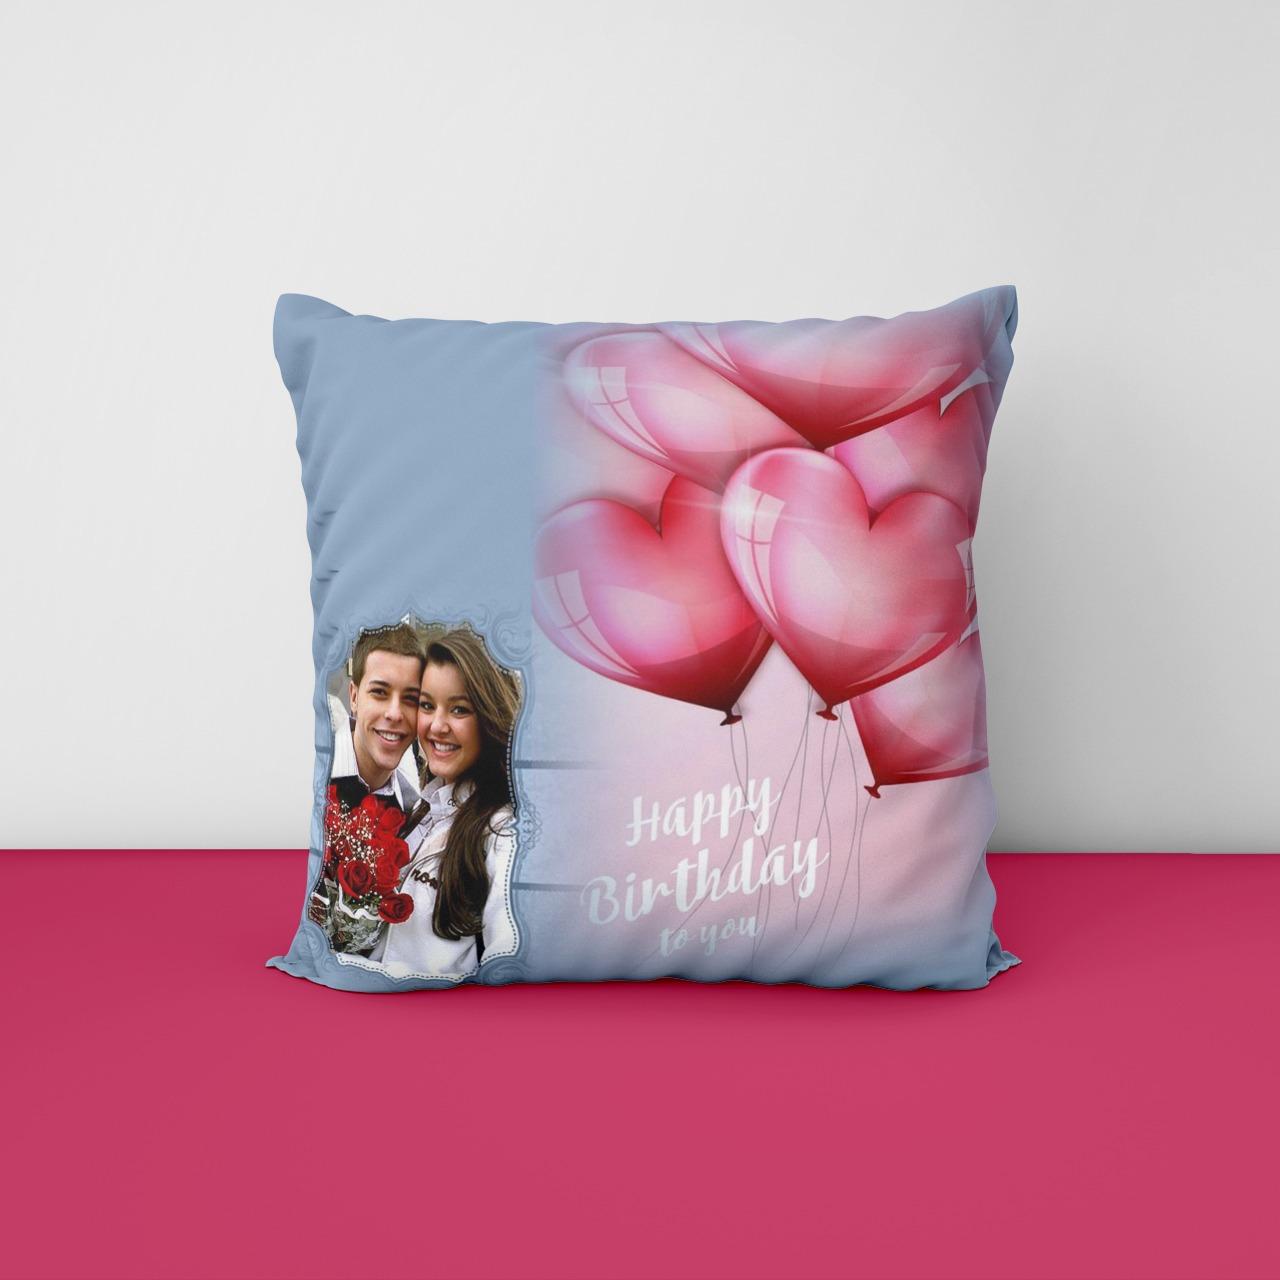 Happy BirthdayPersanilzed Cushion